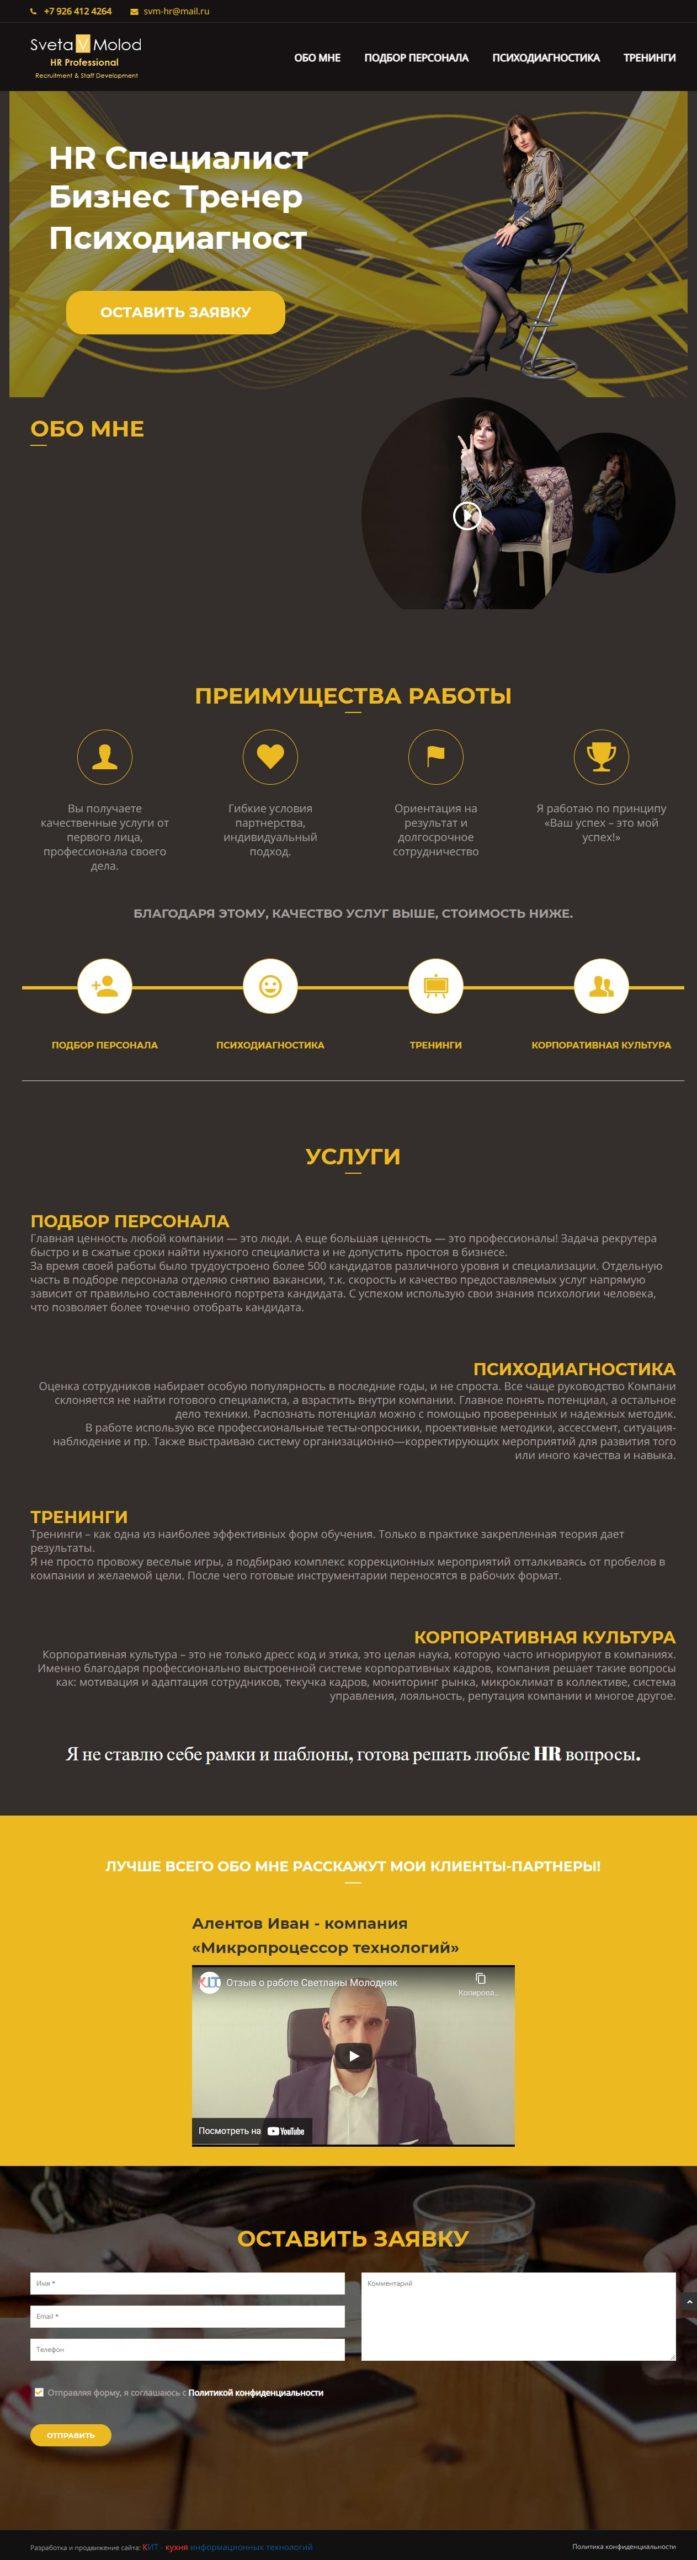 Сайт HR специалиста Светланы Молодняк